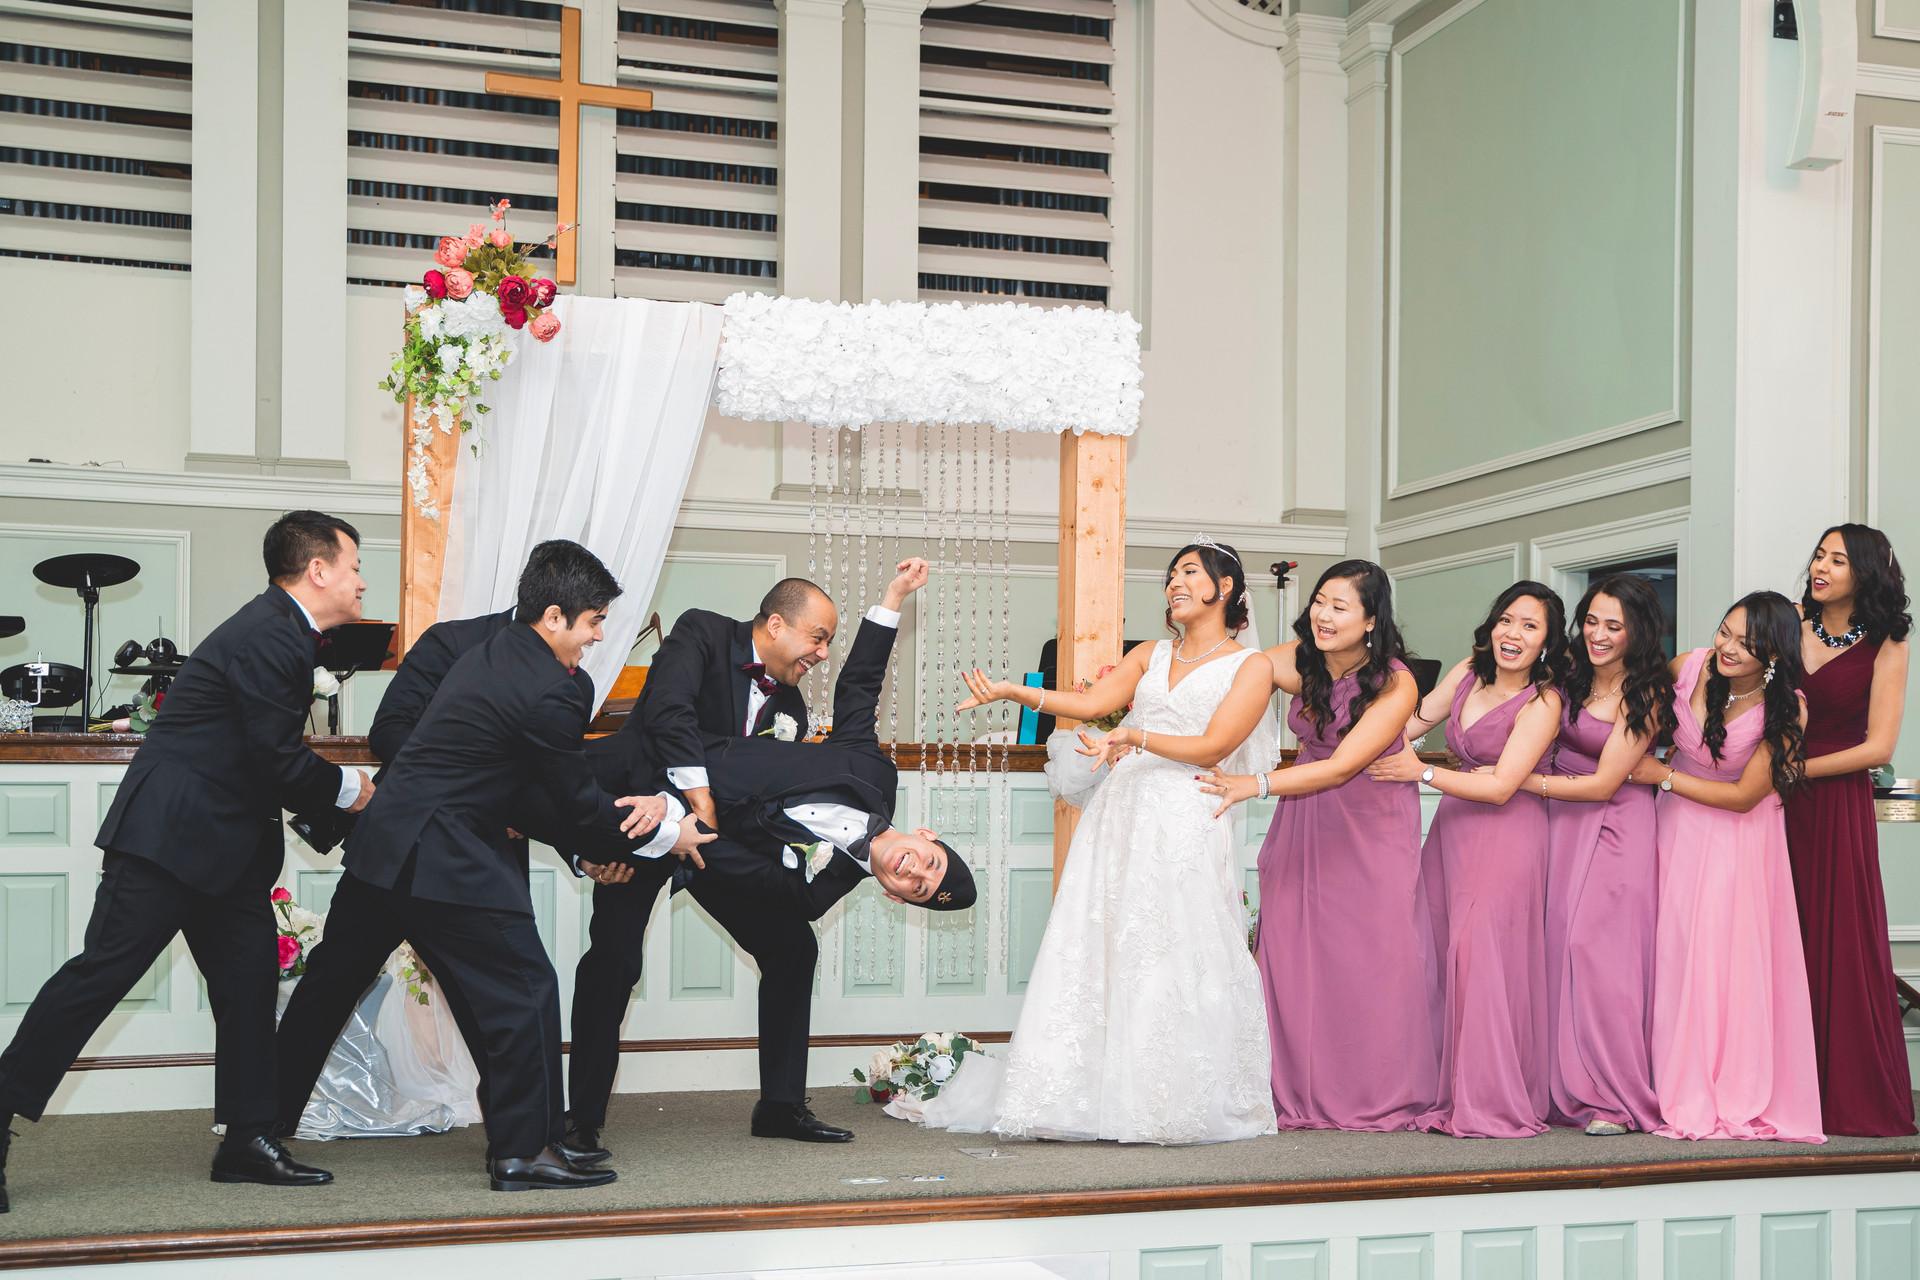 Wedding_Planner_Decor_Arch.jpg